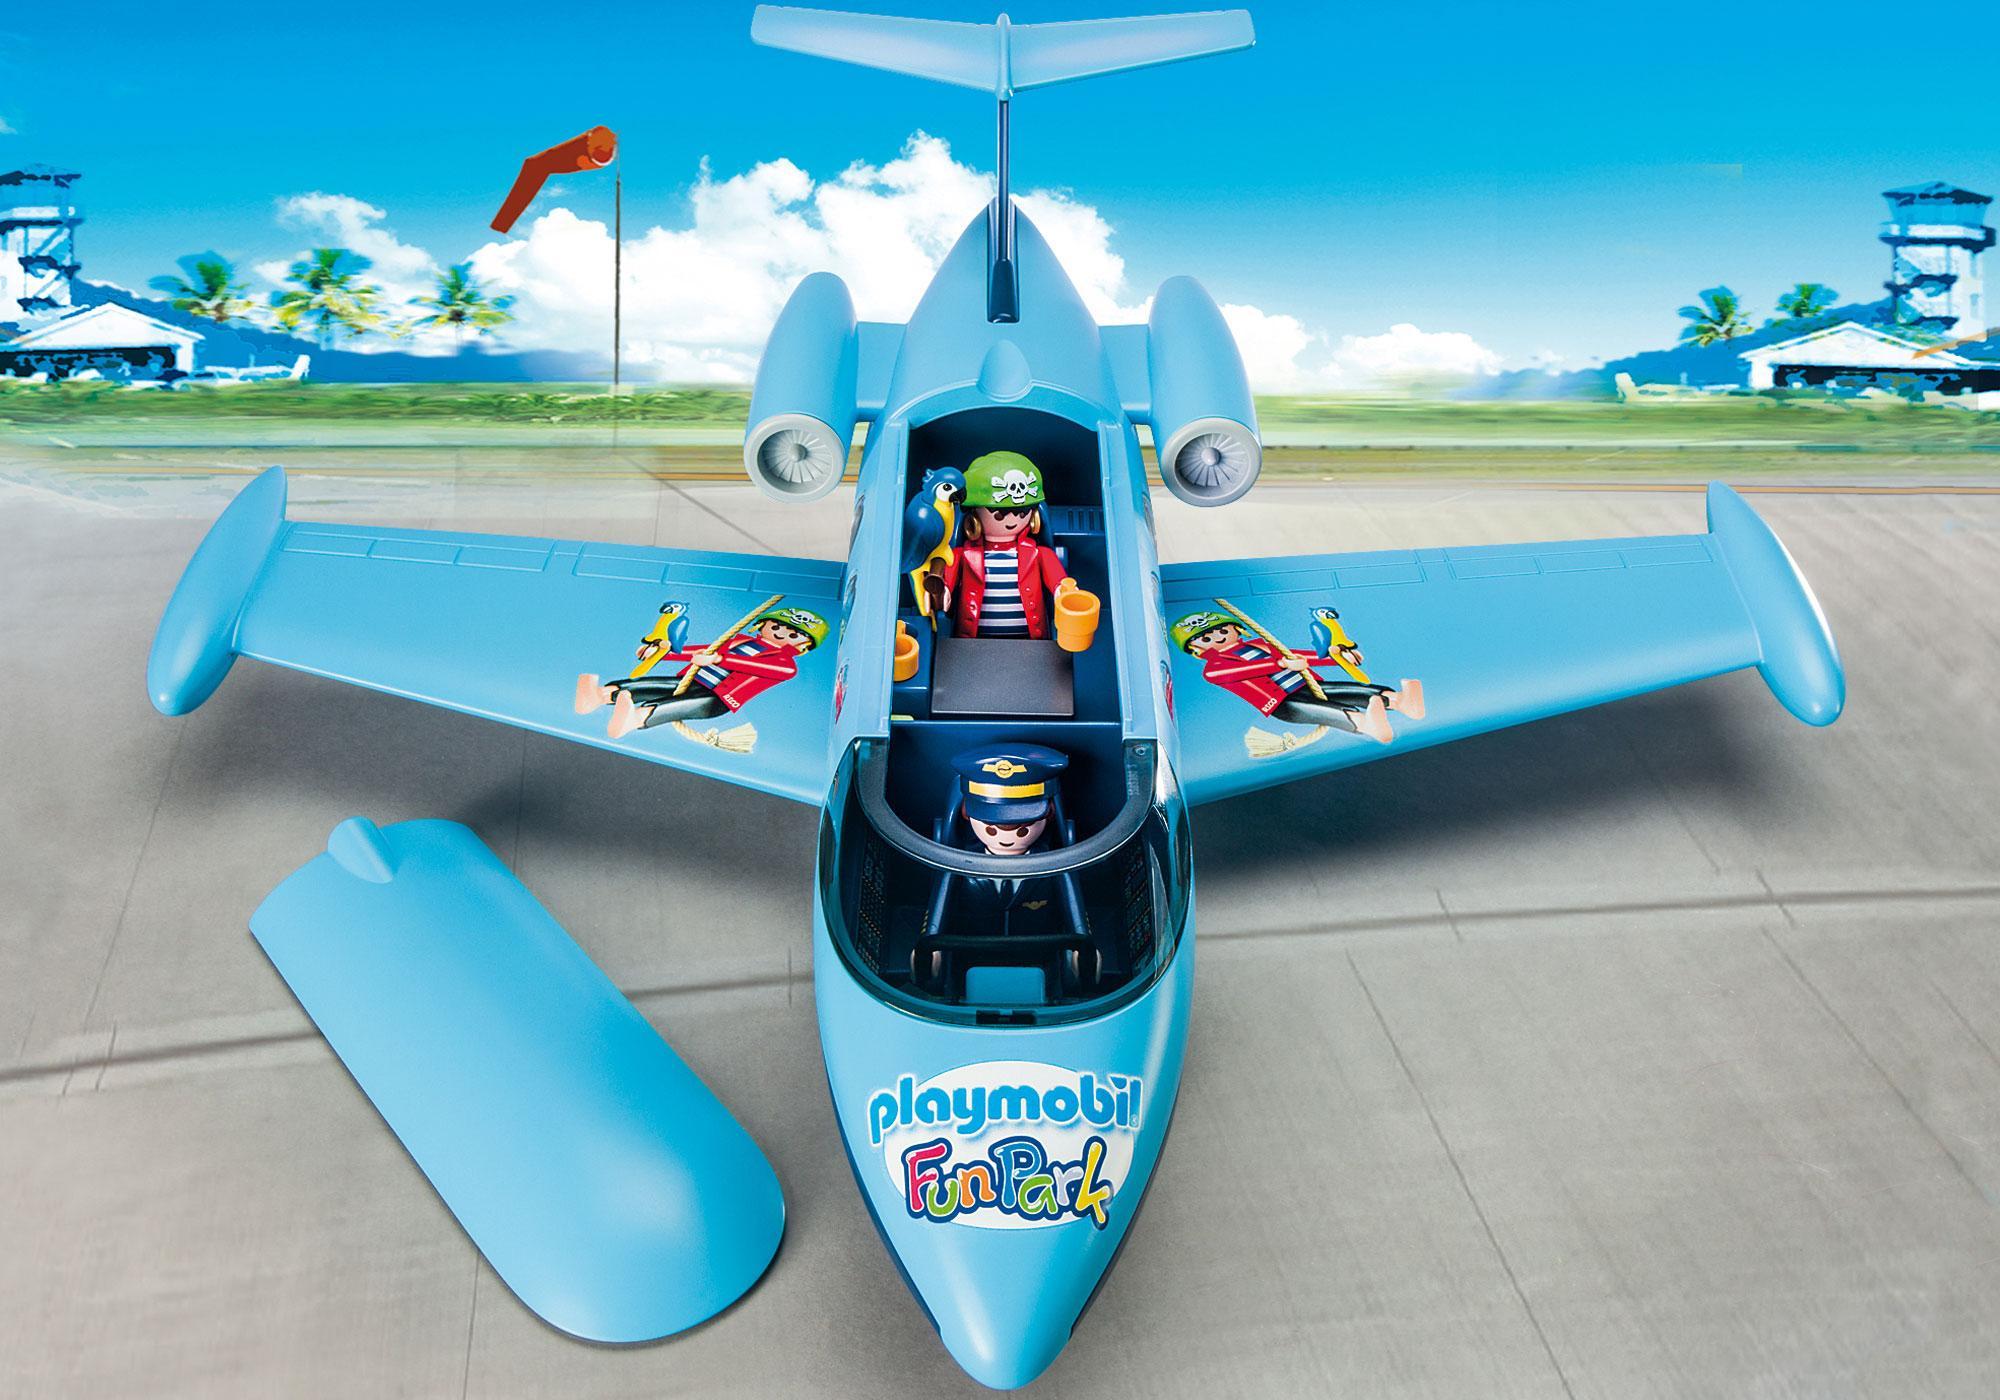 http://media.playmobil.com/i/playmobil/9366_product_extra2/PLAYMOBIL-FunPark sommerjet